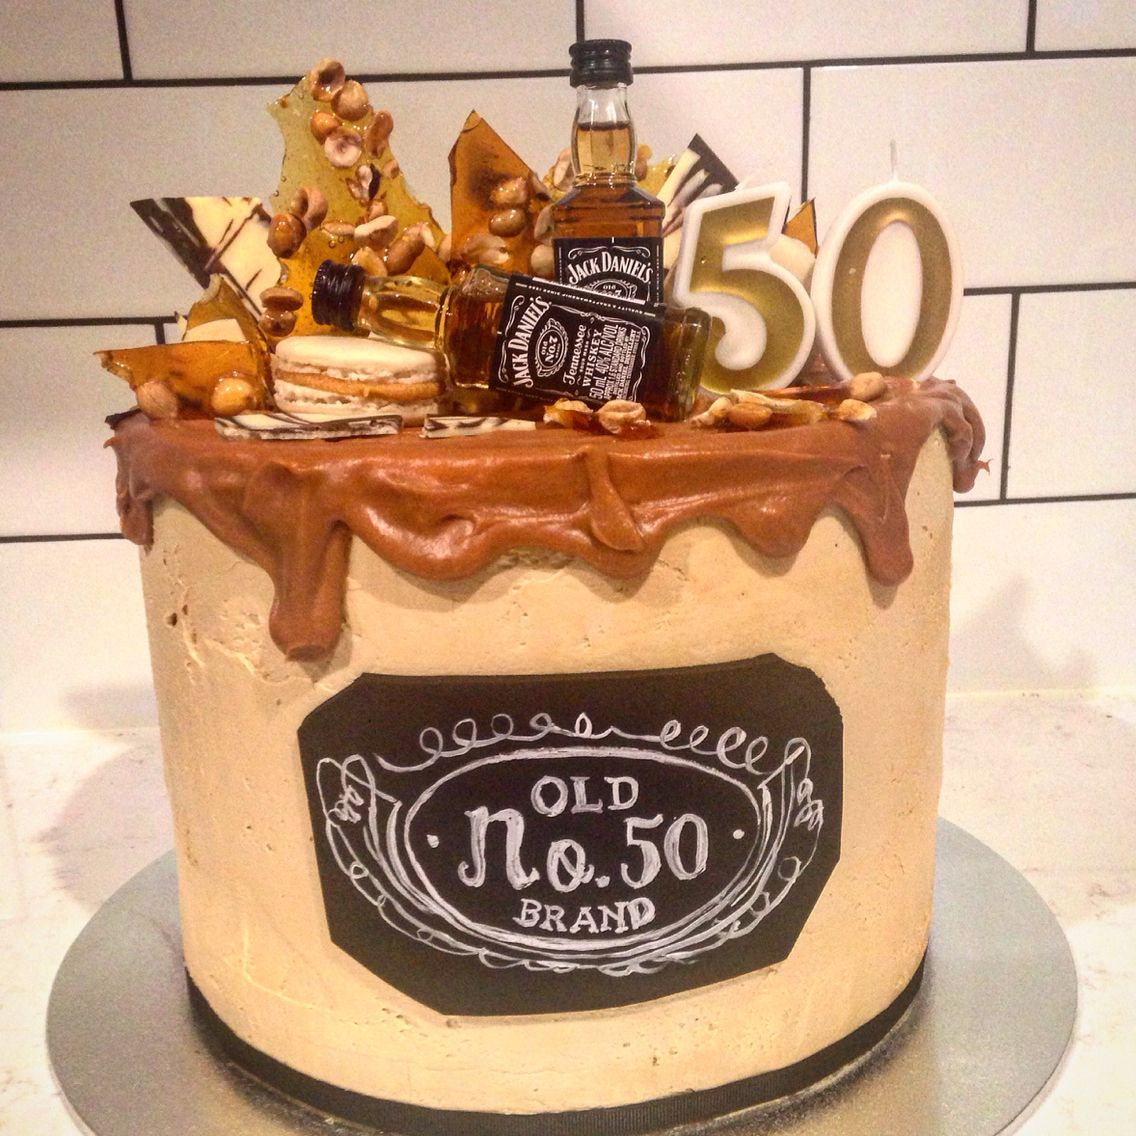 Jack Daniels 50th Birthday Cake. Layers Of Chocolate Cake